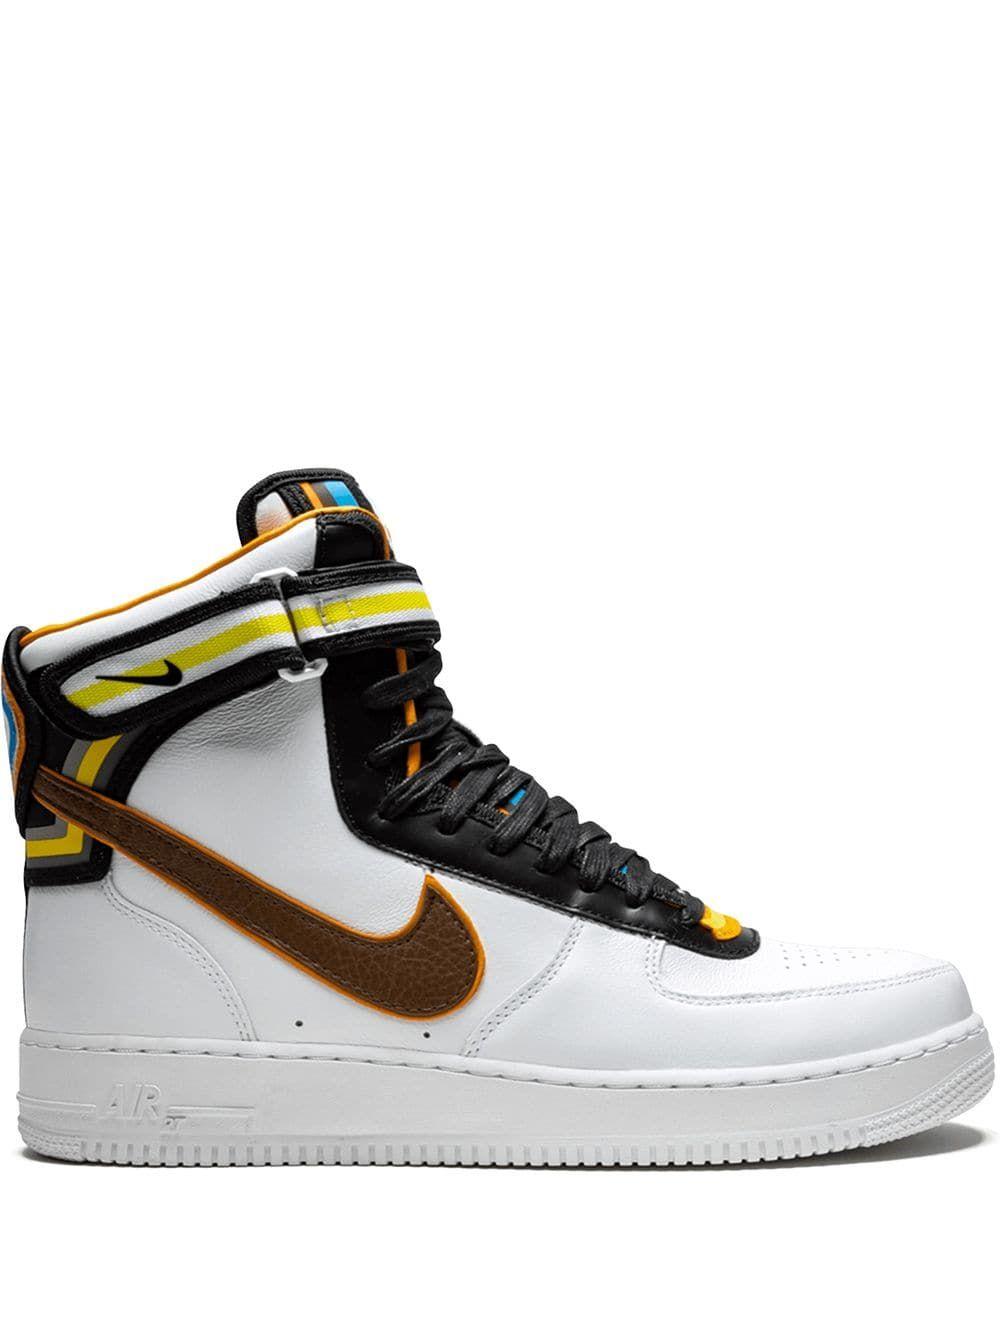 Nike Air Force 1 Hi SP Tisci sneakers - White | Nike air force